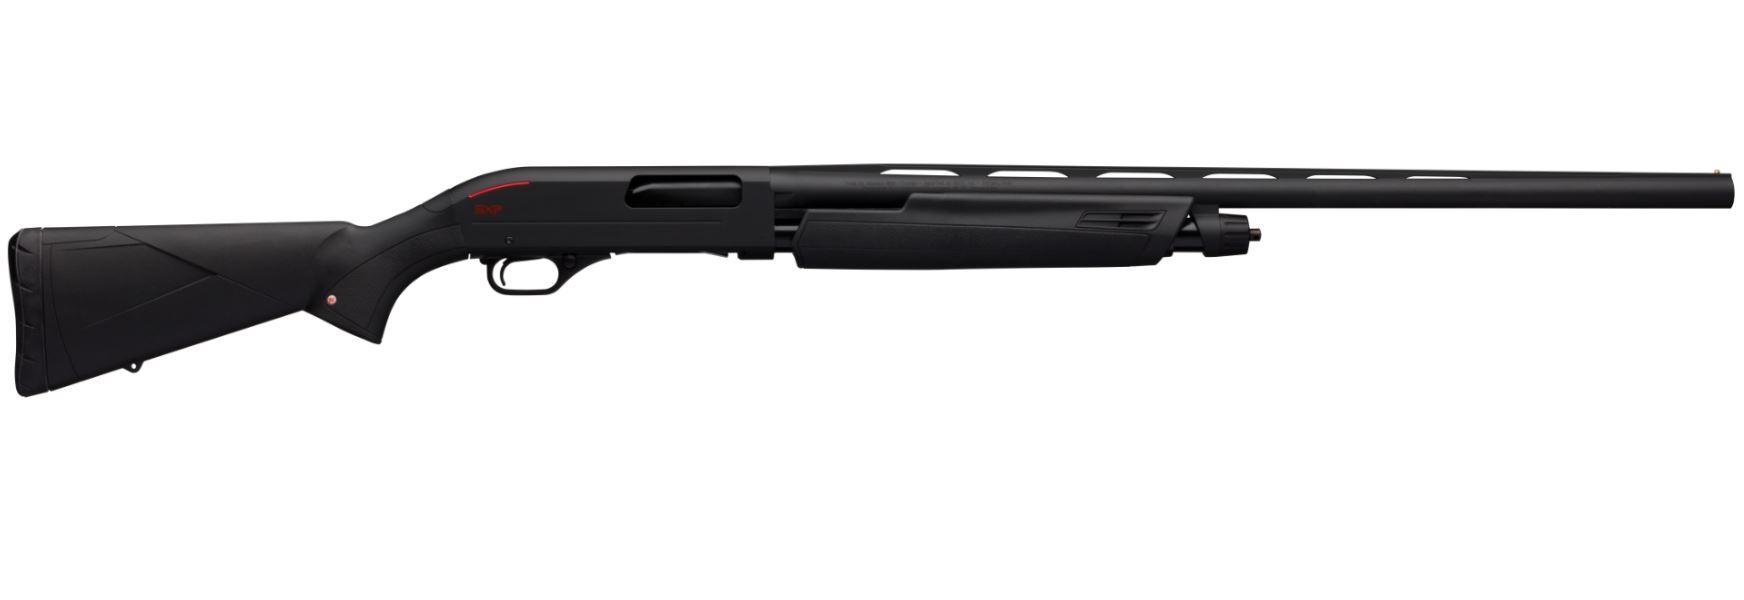 Winchester SXP Black Shadow 12 Gauge